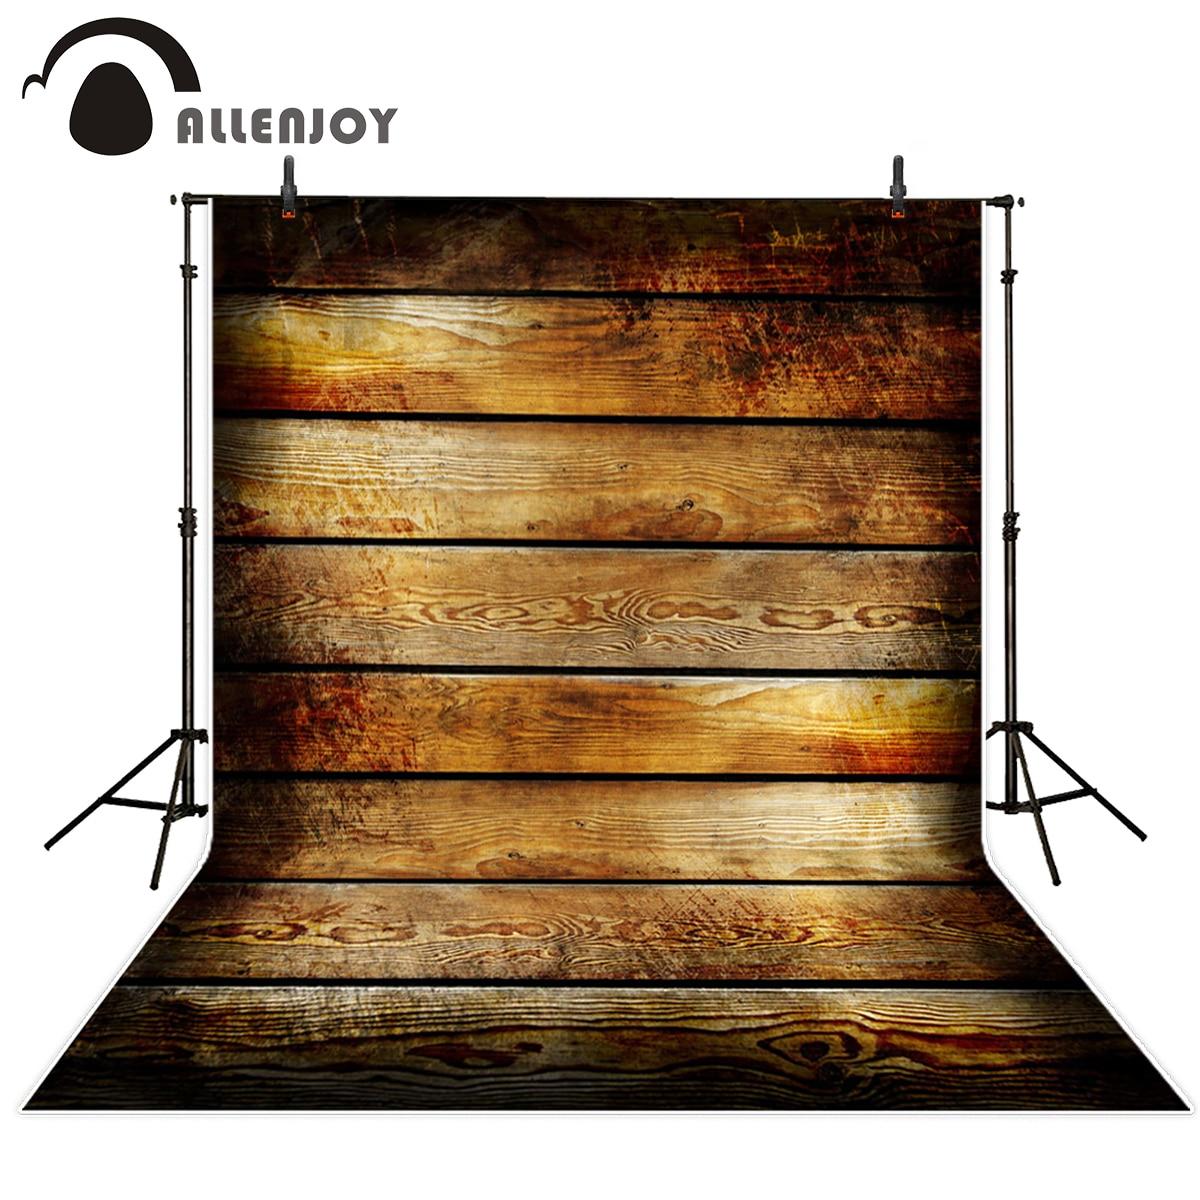 Allenjoy photography backdrops Wood vintage photography studio background vinyl backdrops for photography Backgrounds 10x10ft vinyl custom wood grain photography backdrops prop studio background tmw 20191